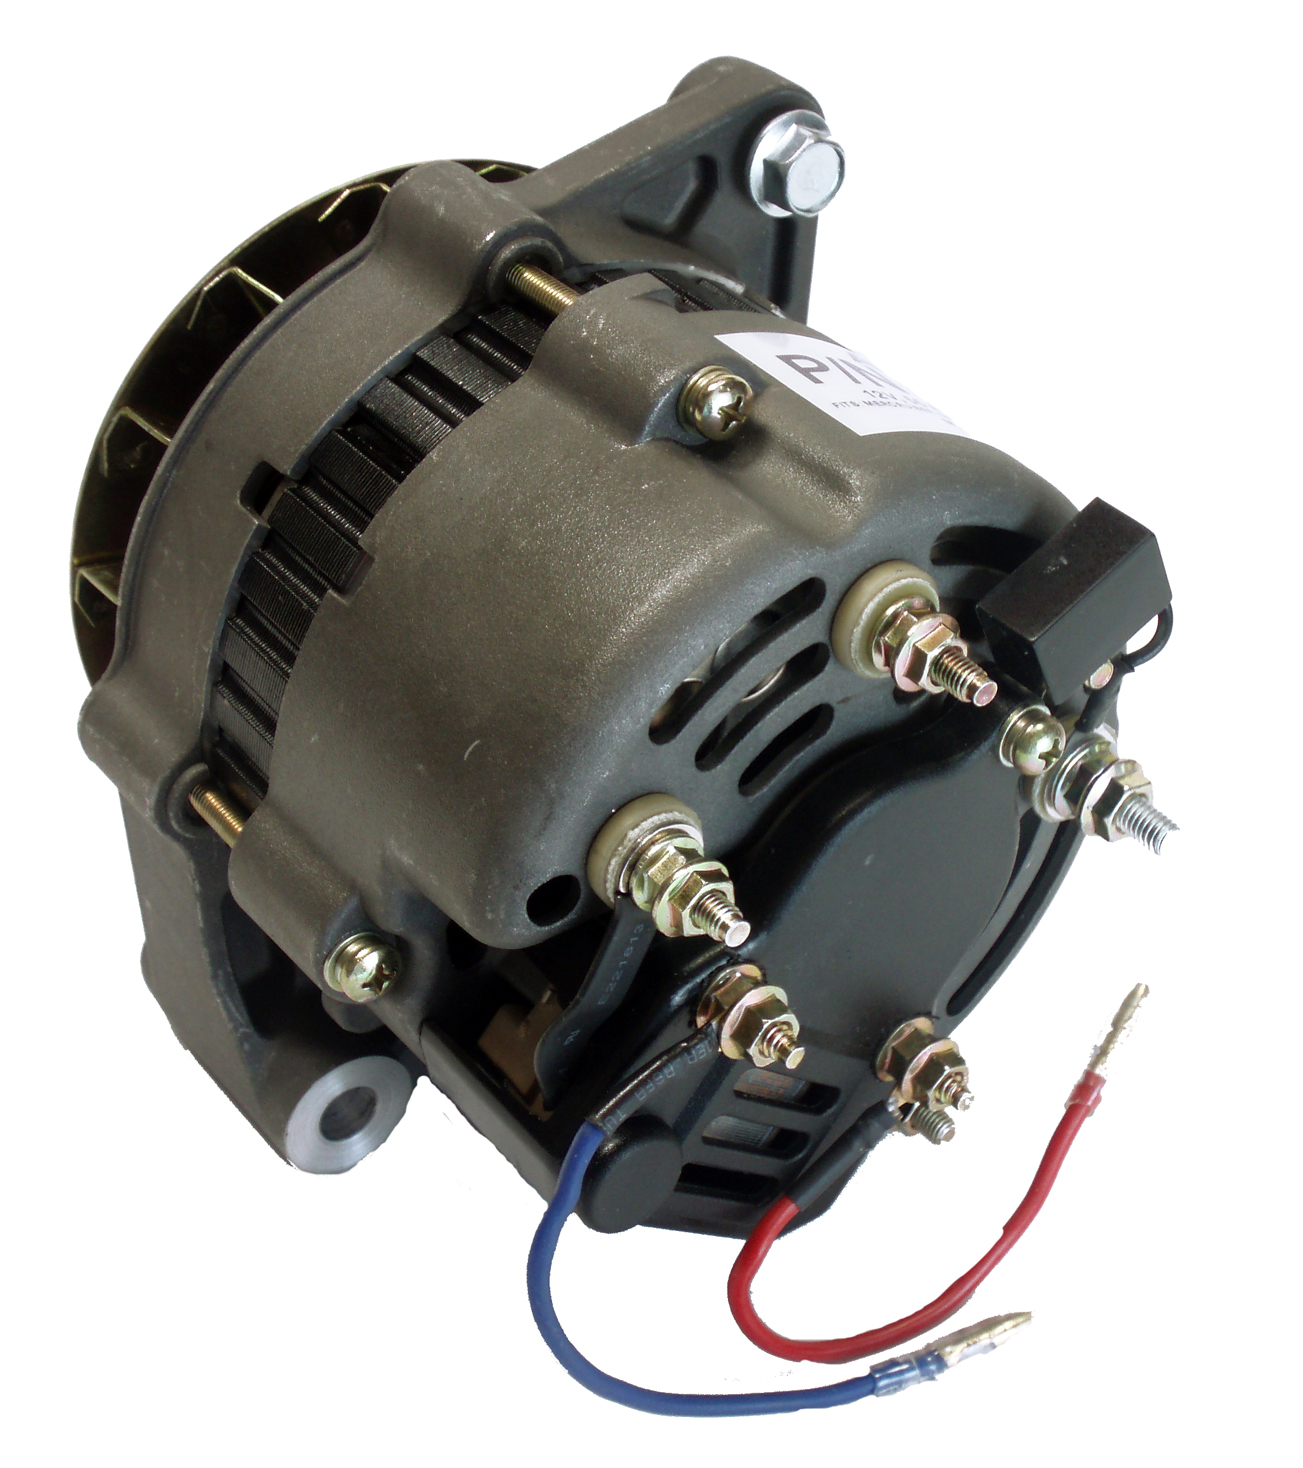 mercruiser electrical diagram    mercruiser     omc  volvo penta 12v 65 amp mando style     mercruiser     omc  volvo penta 12v 65 amp mando style